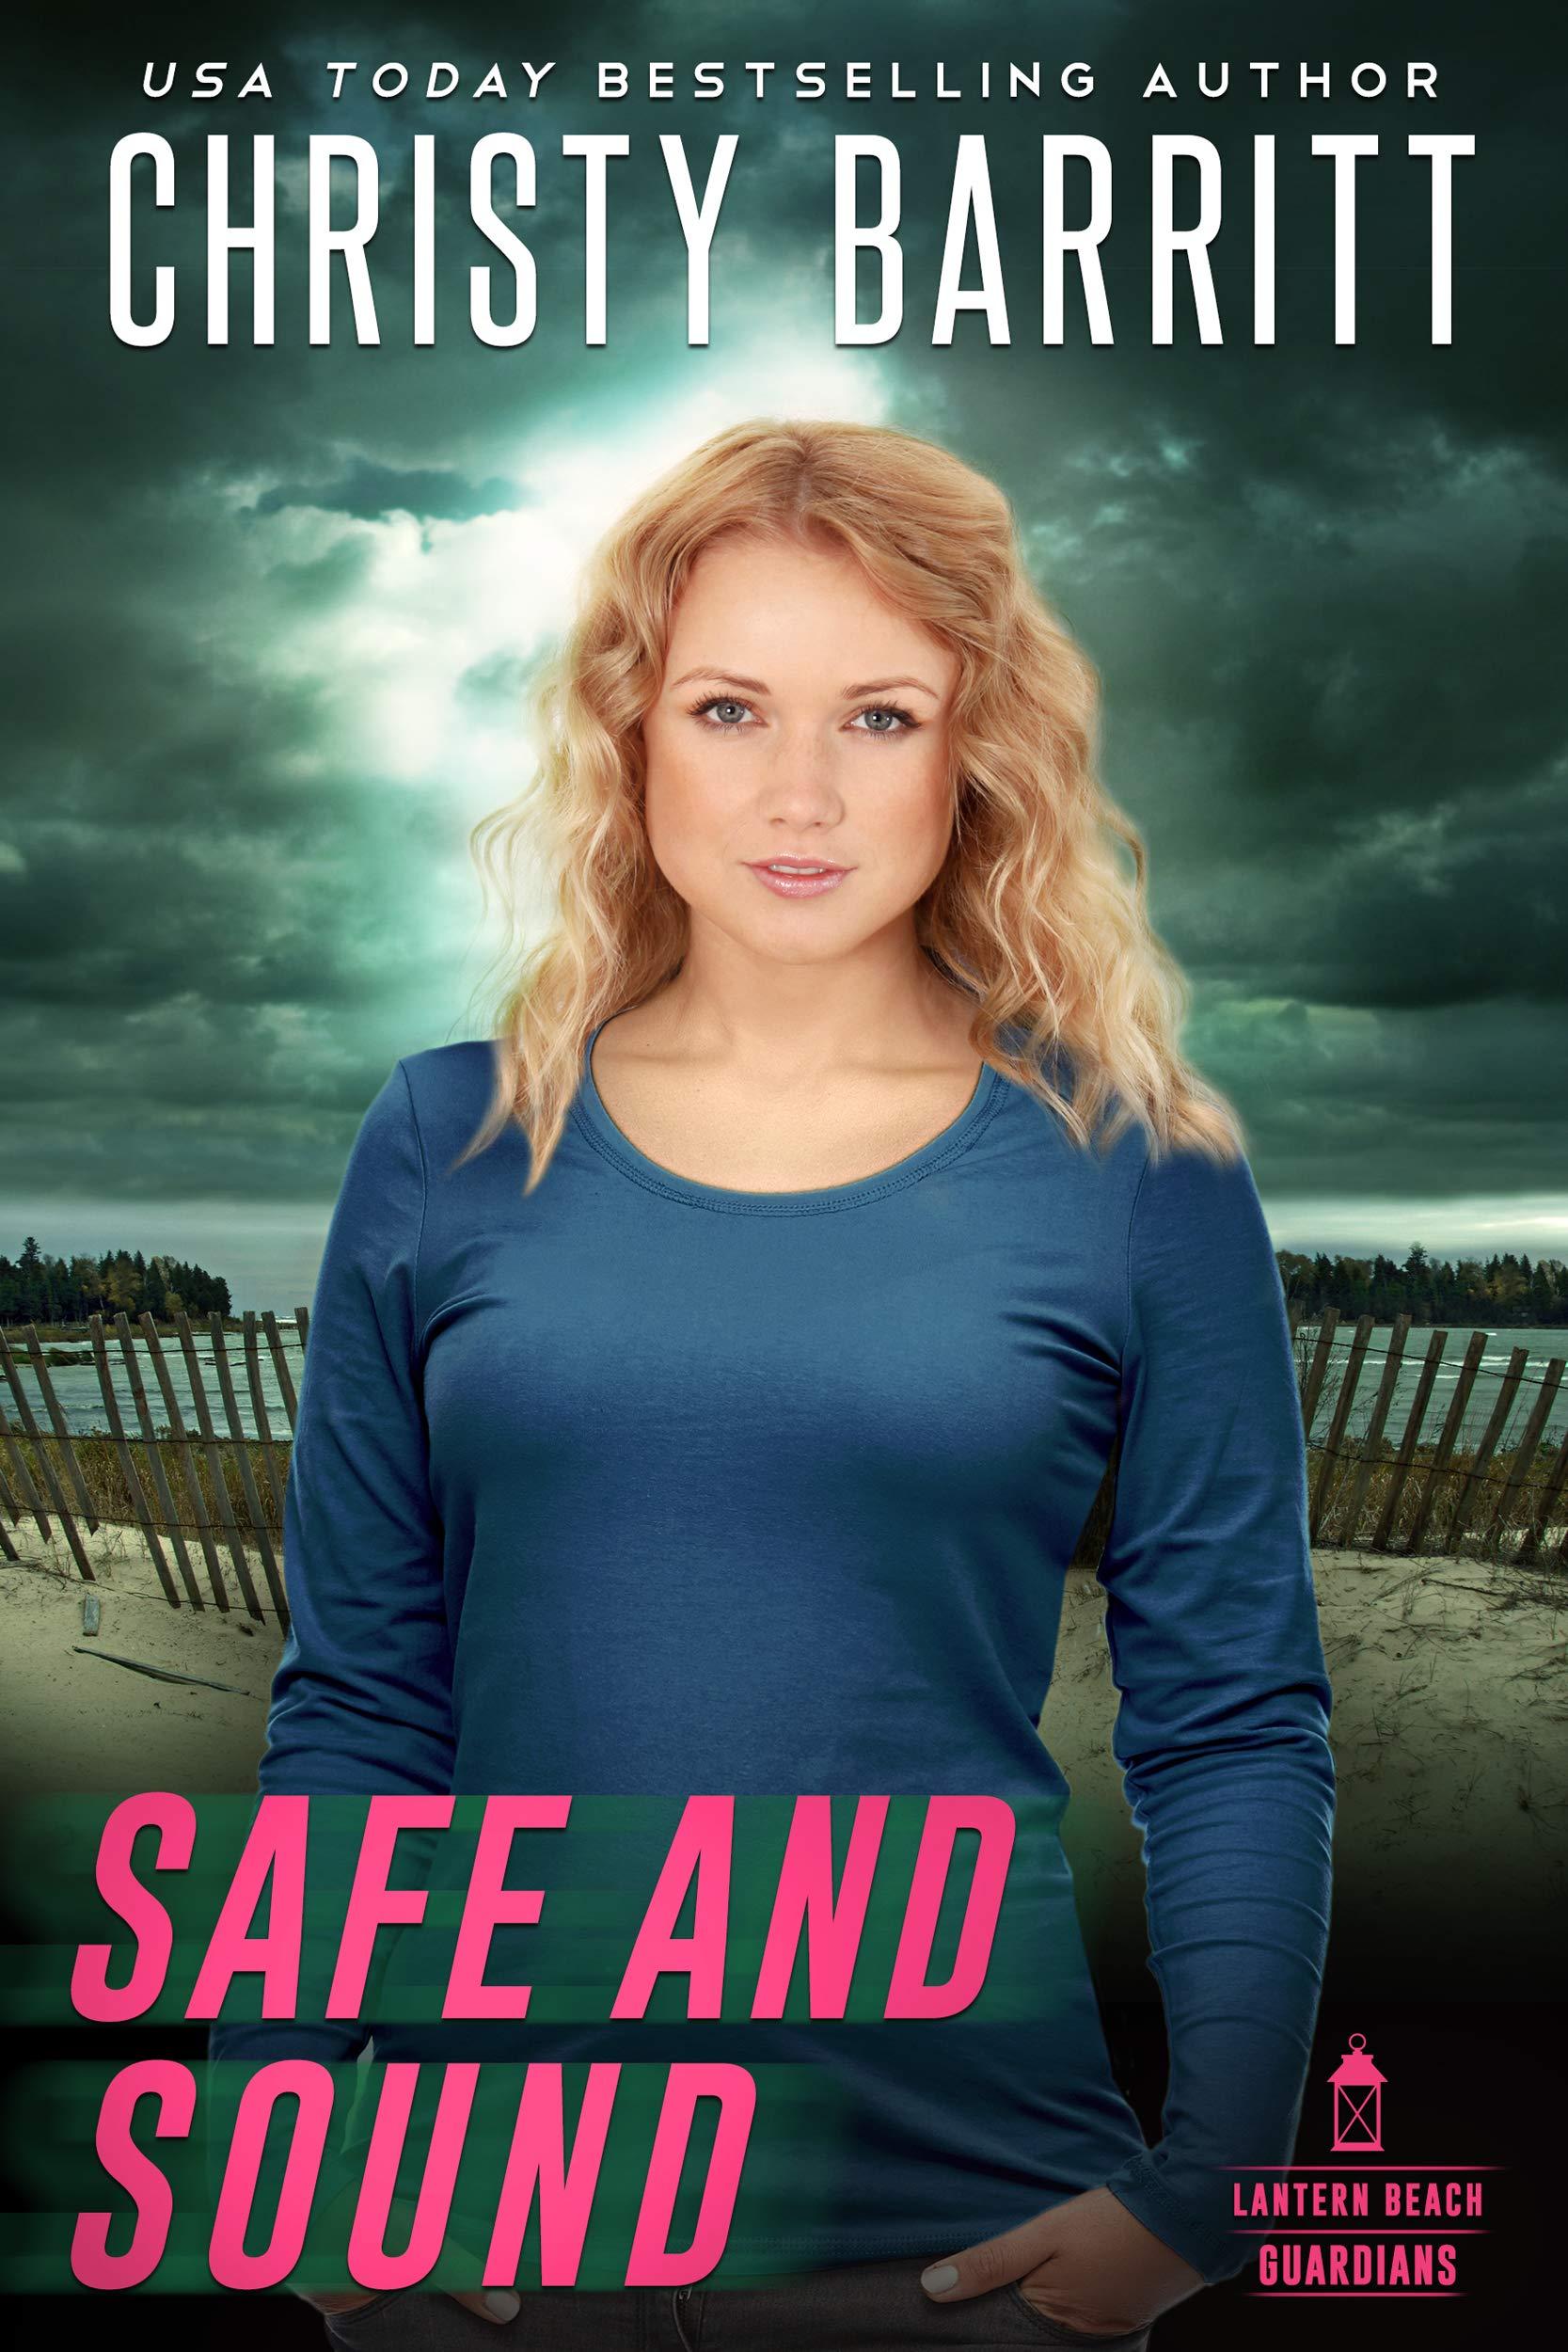 Safe and Sound (Lantern Beach Guardians #3)